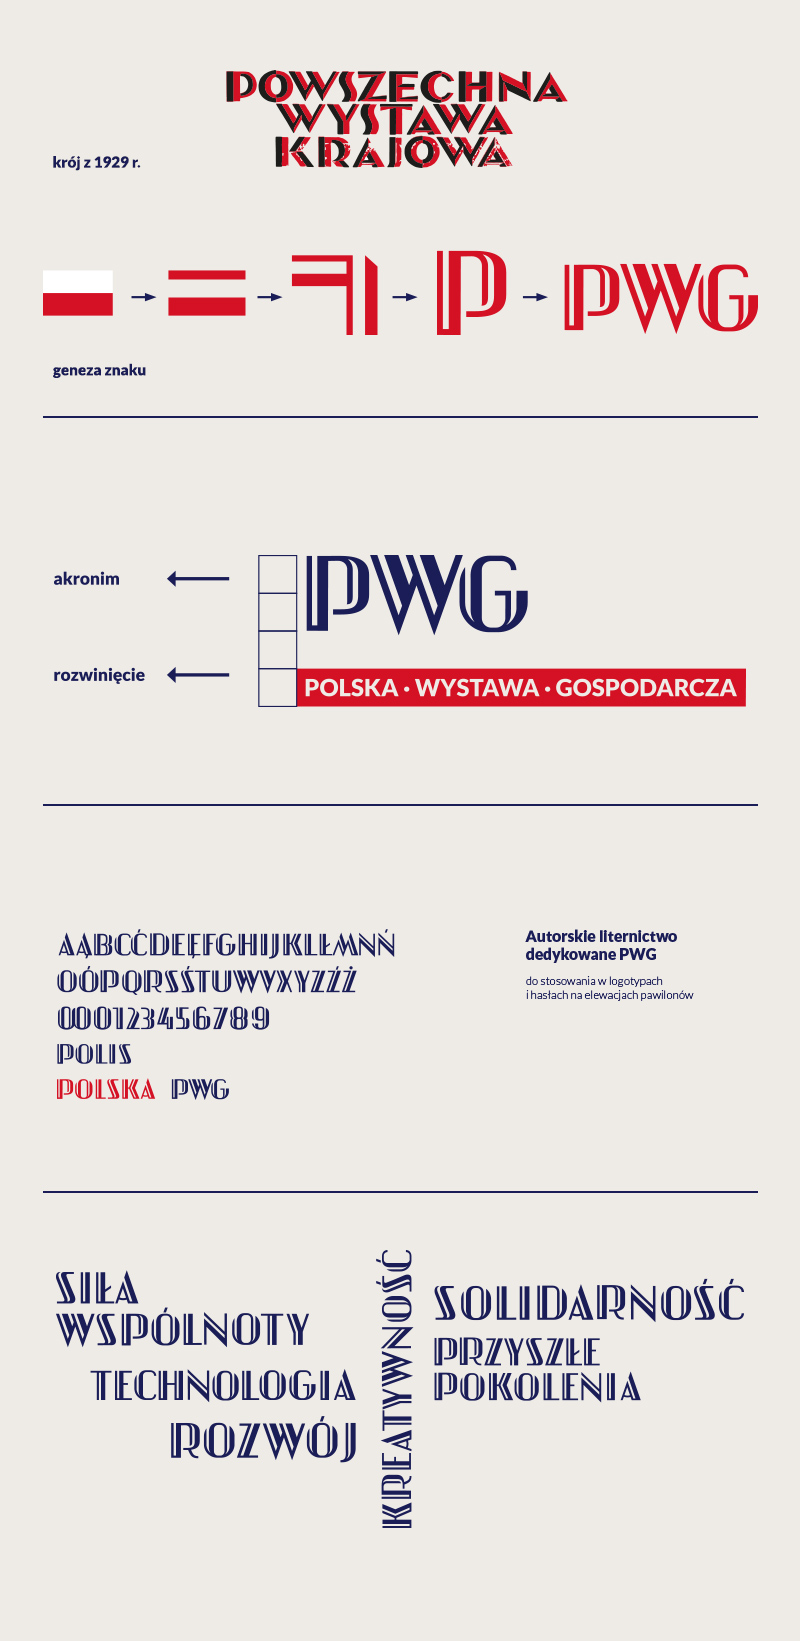 PWG Polish Economic Exhibition